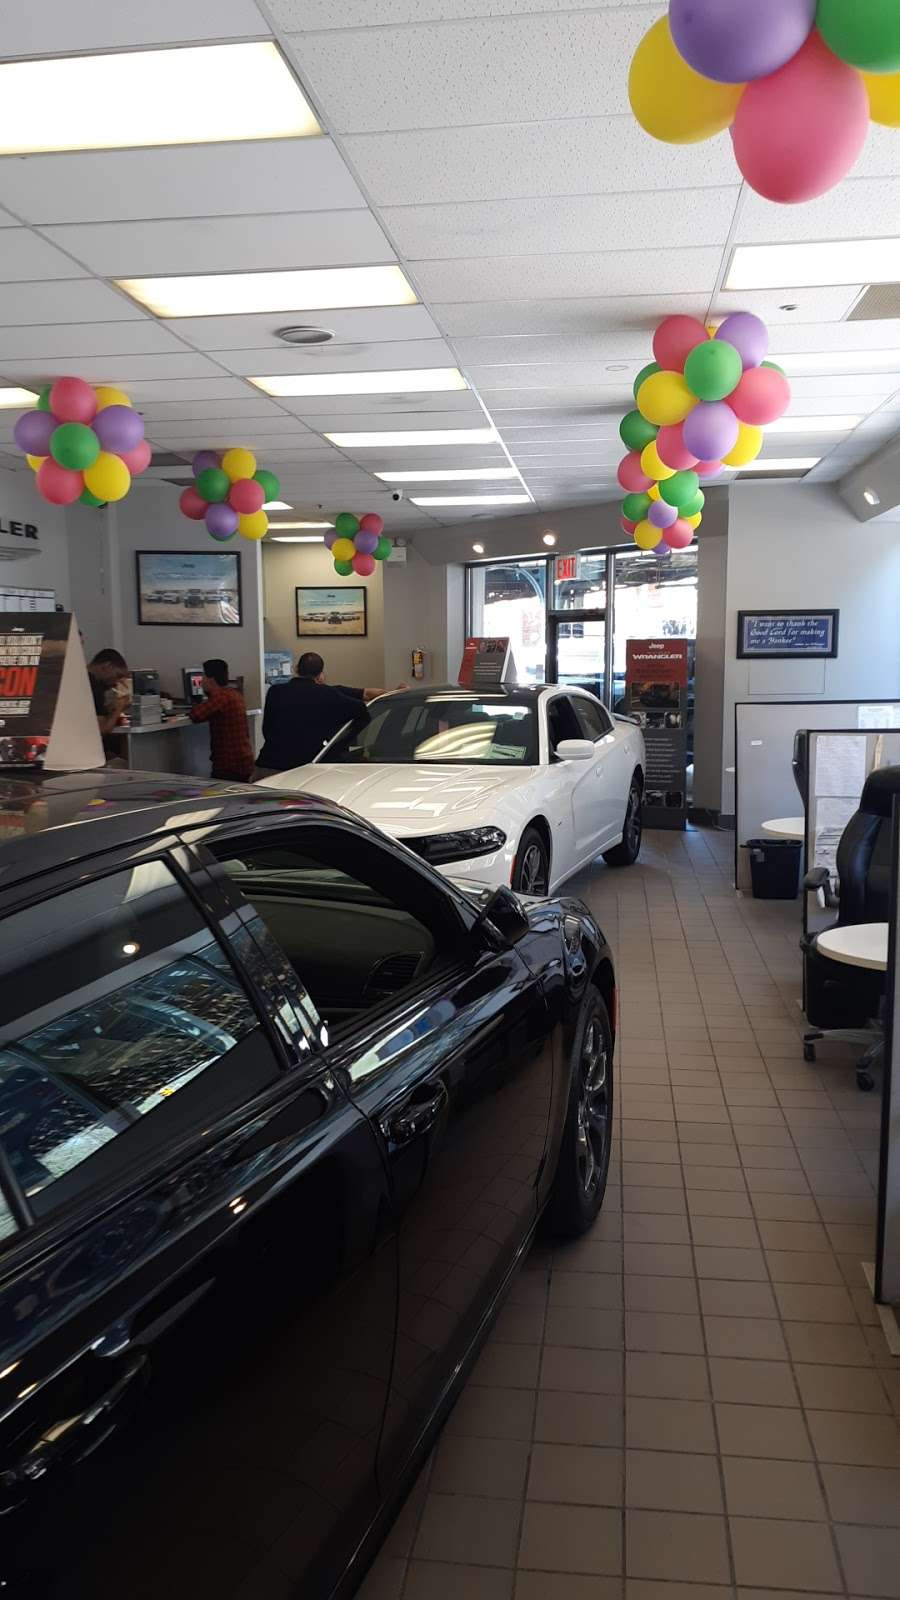 Riverdale Chrysler Jeep Dodge Ram - car dealer  | Photo 1 of 10 | Address: 5869 Broadway, Bronx, NY 10463, USA | Phone: (718) 548-2800